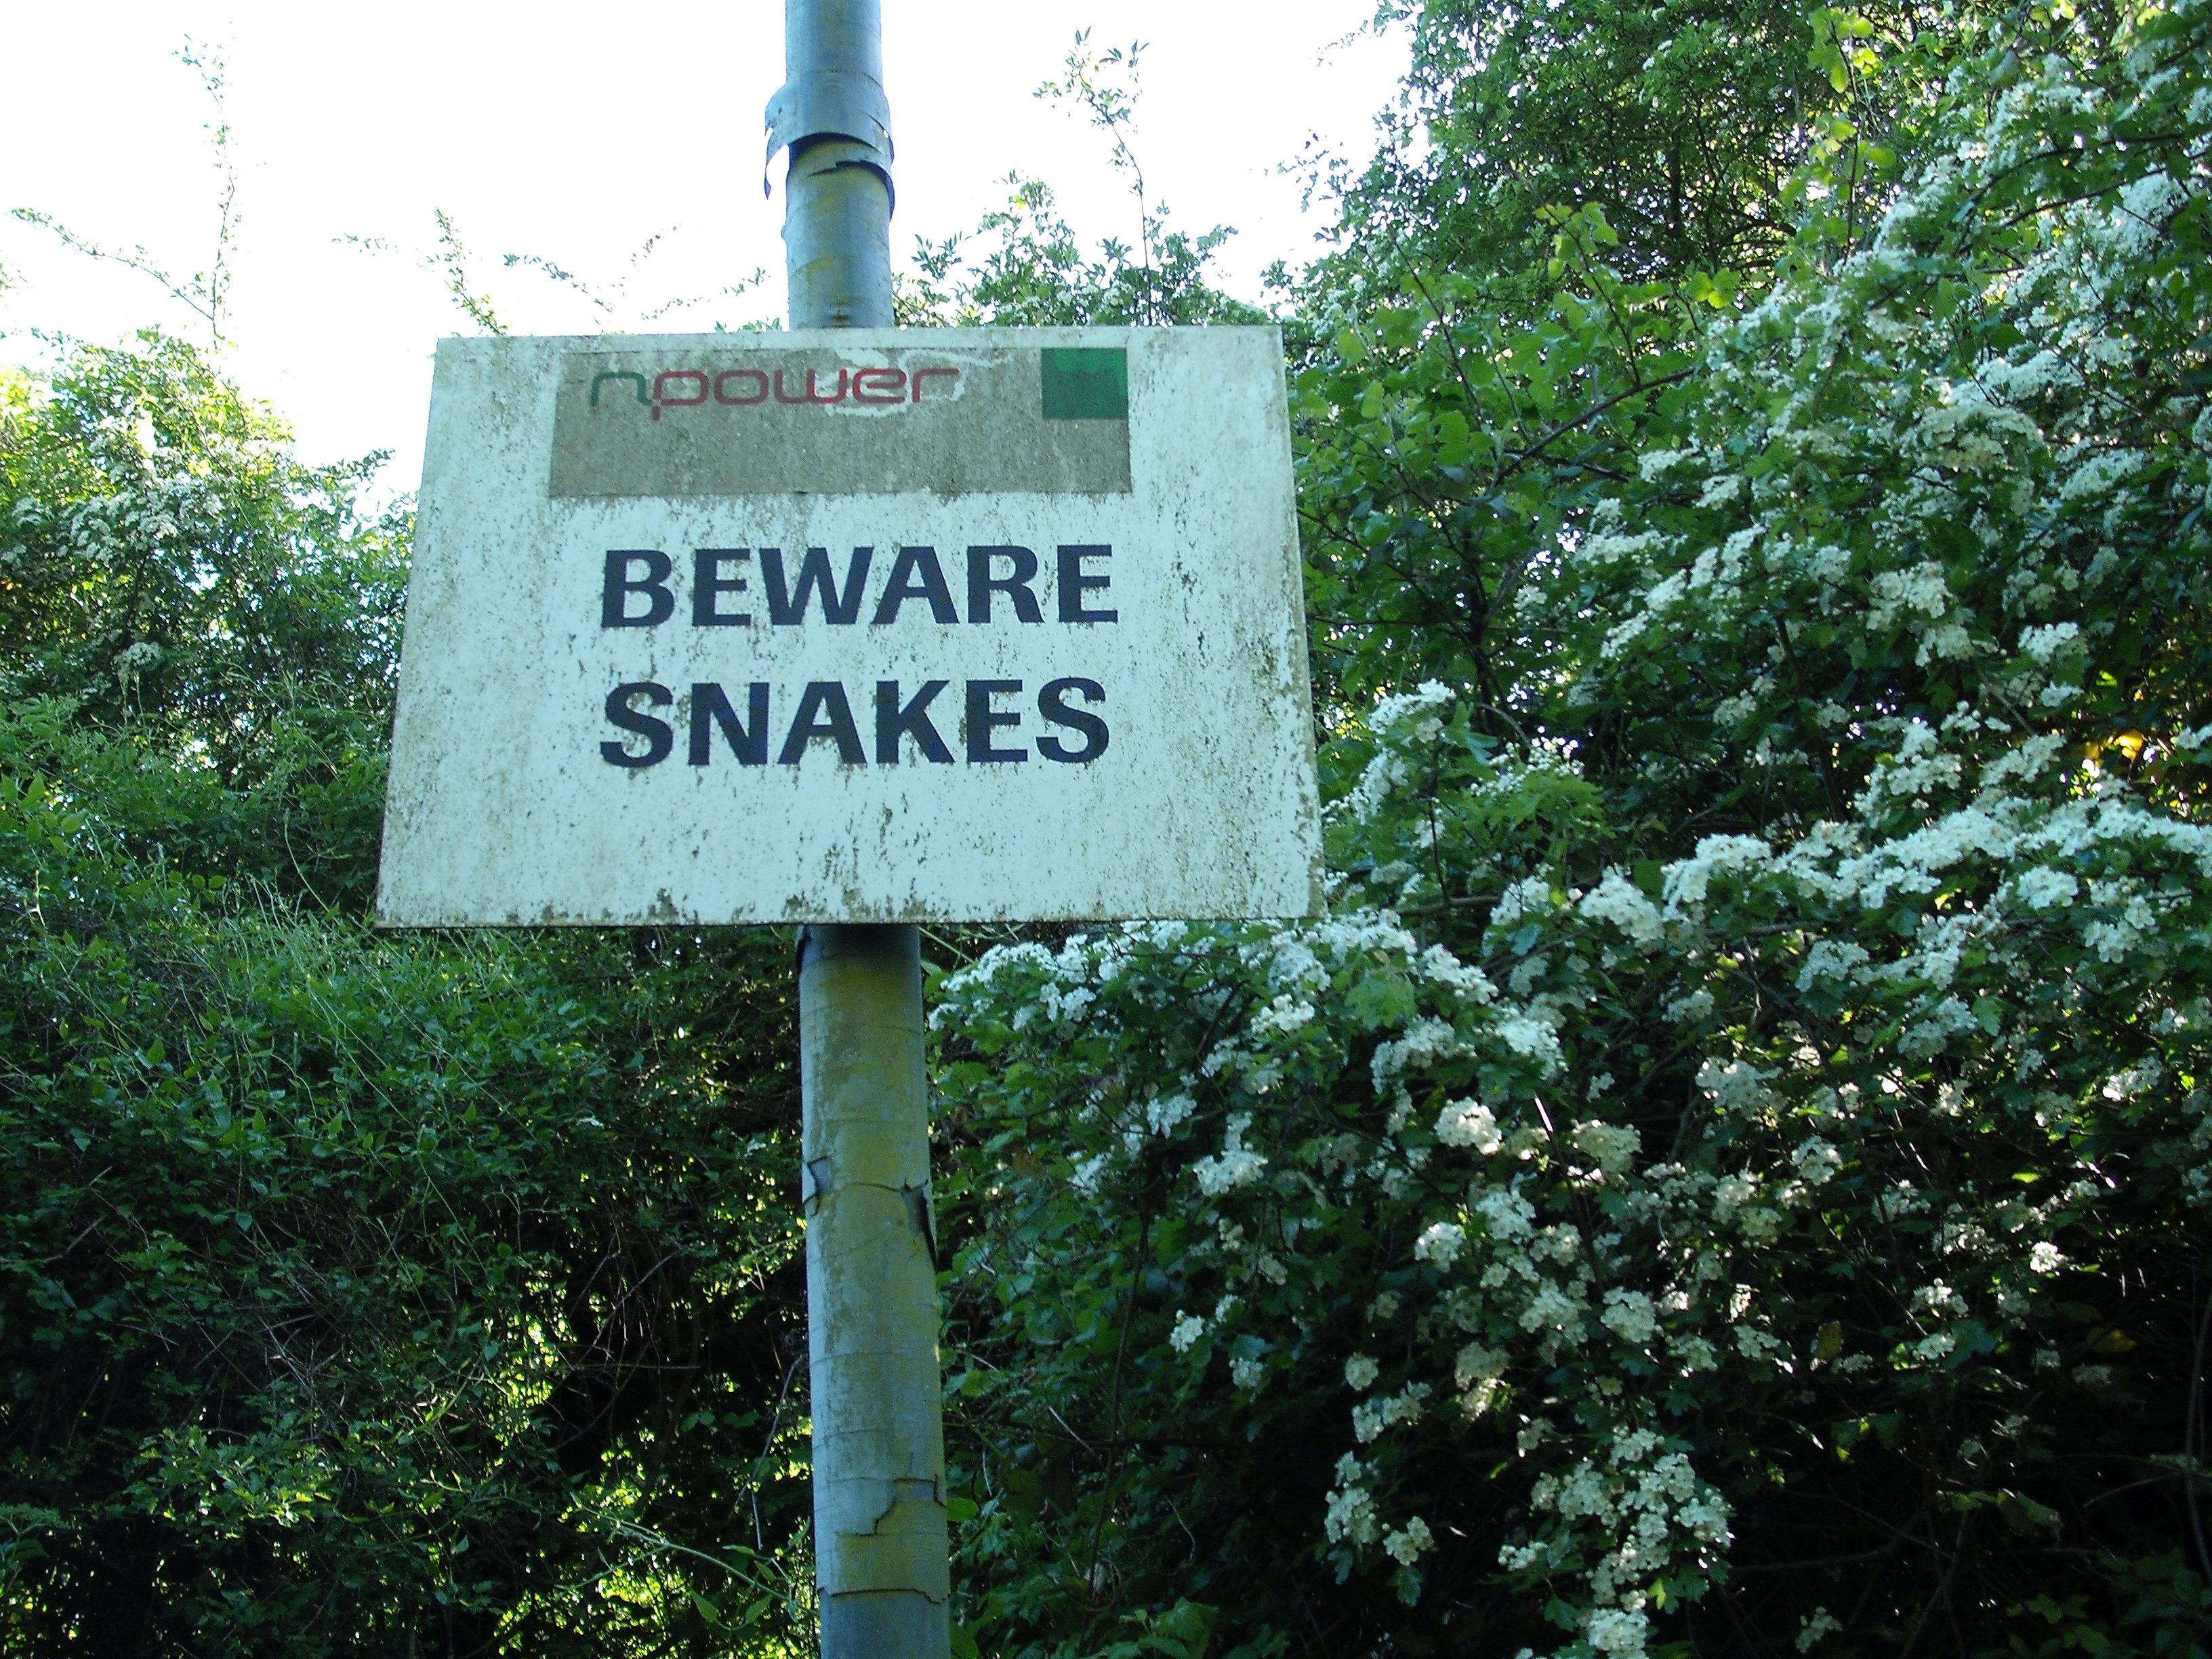 Beware snakes npower